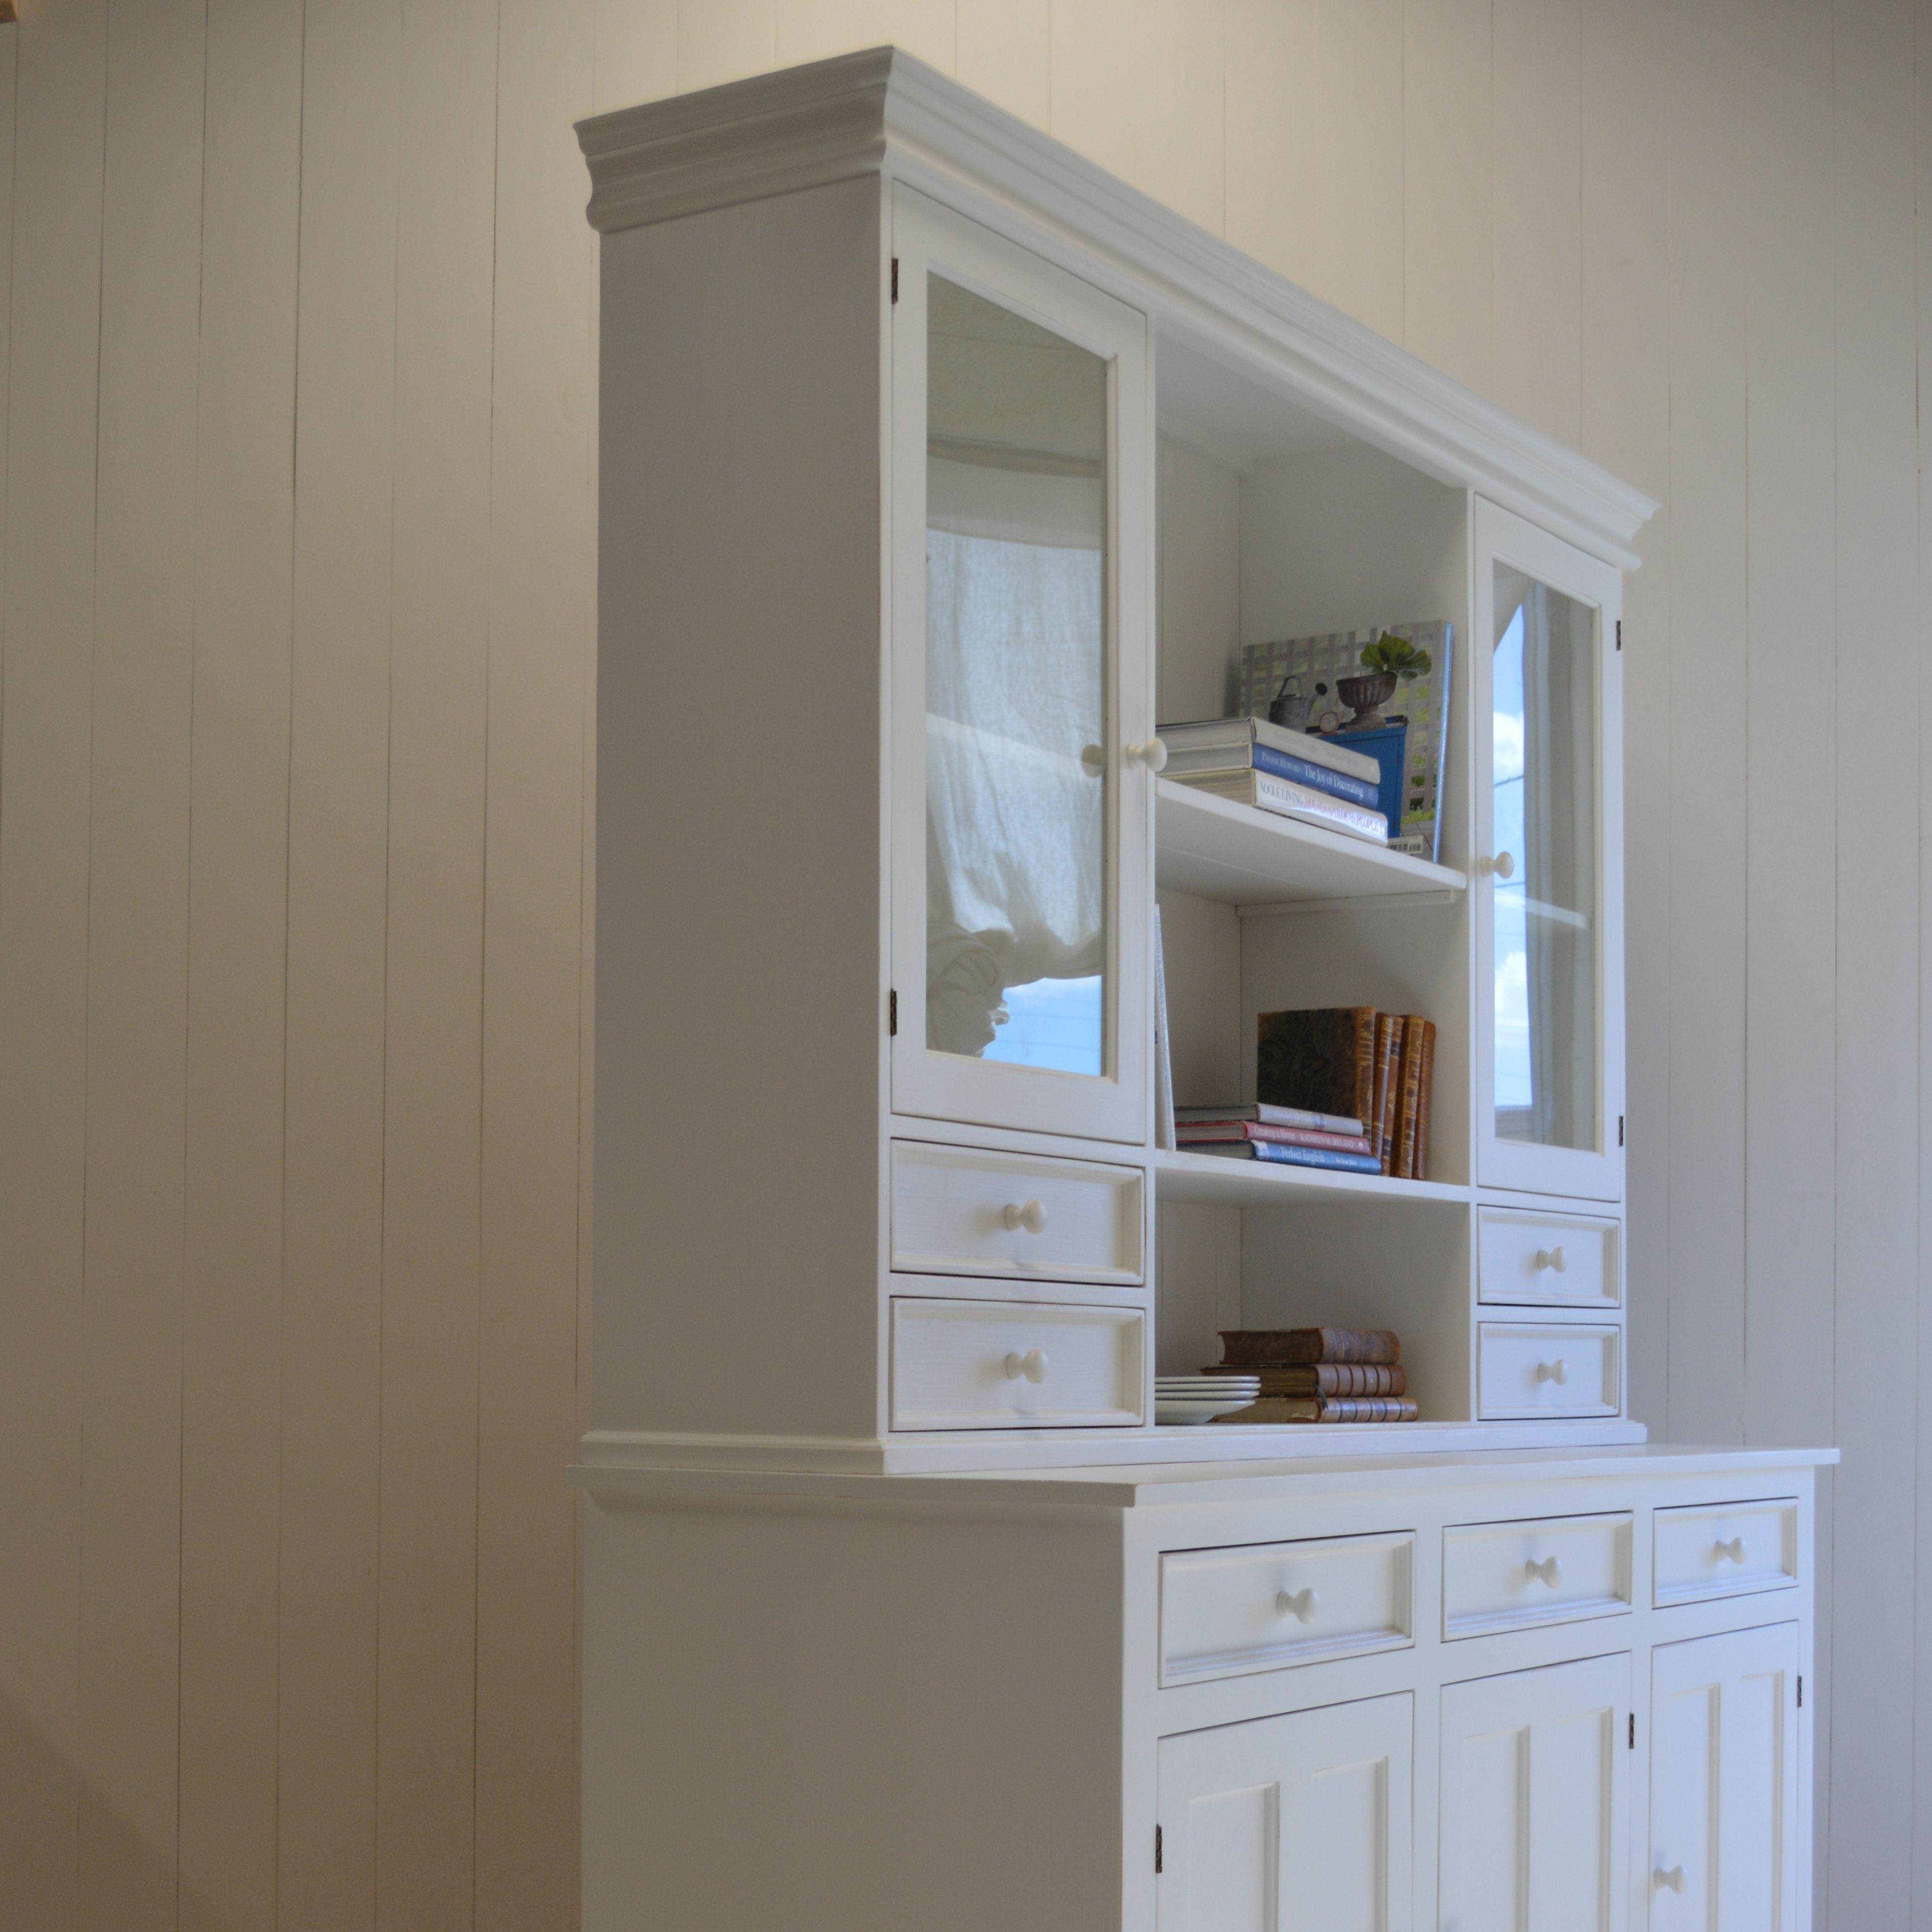 London Kitchen Dresser Ben. Mooreu0027s Simply White